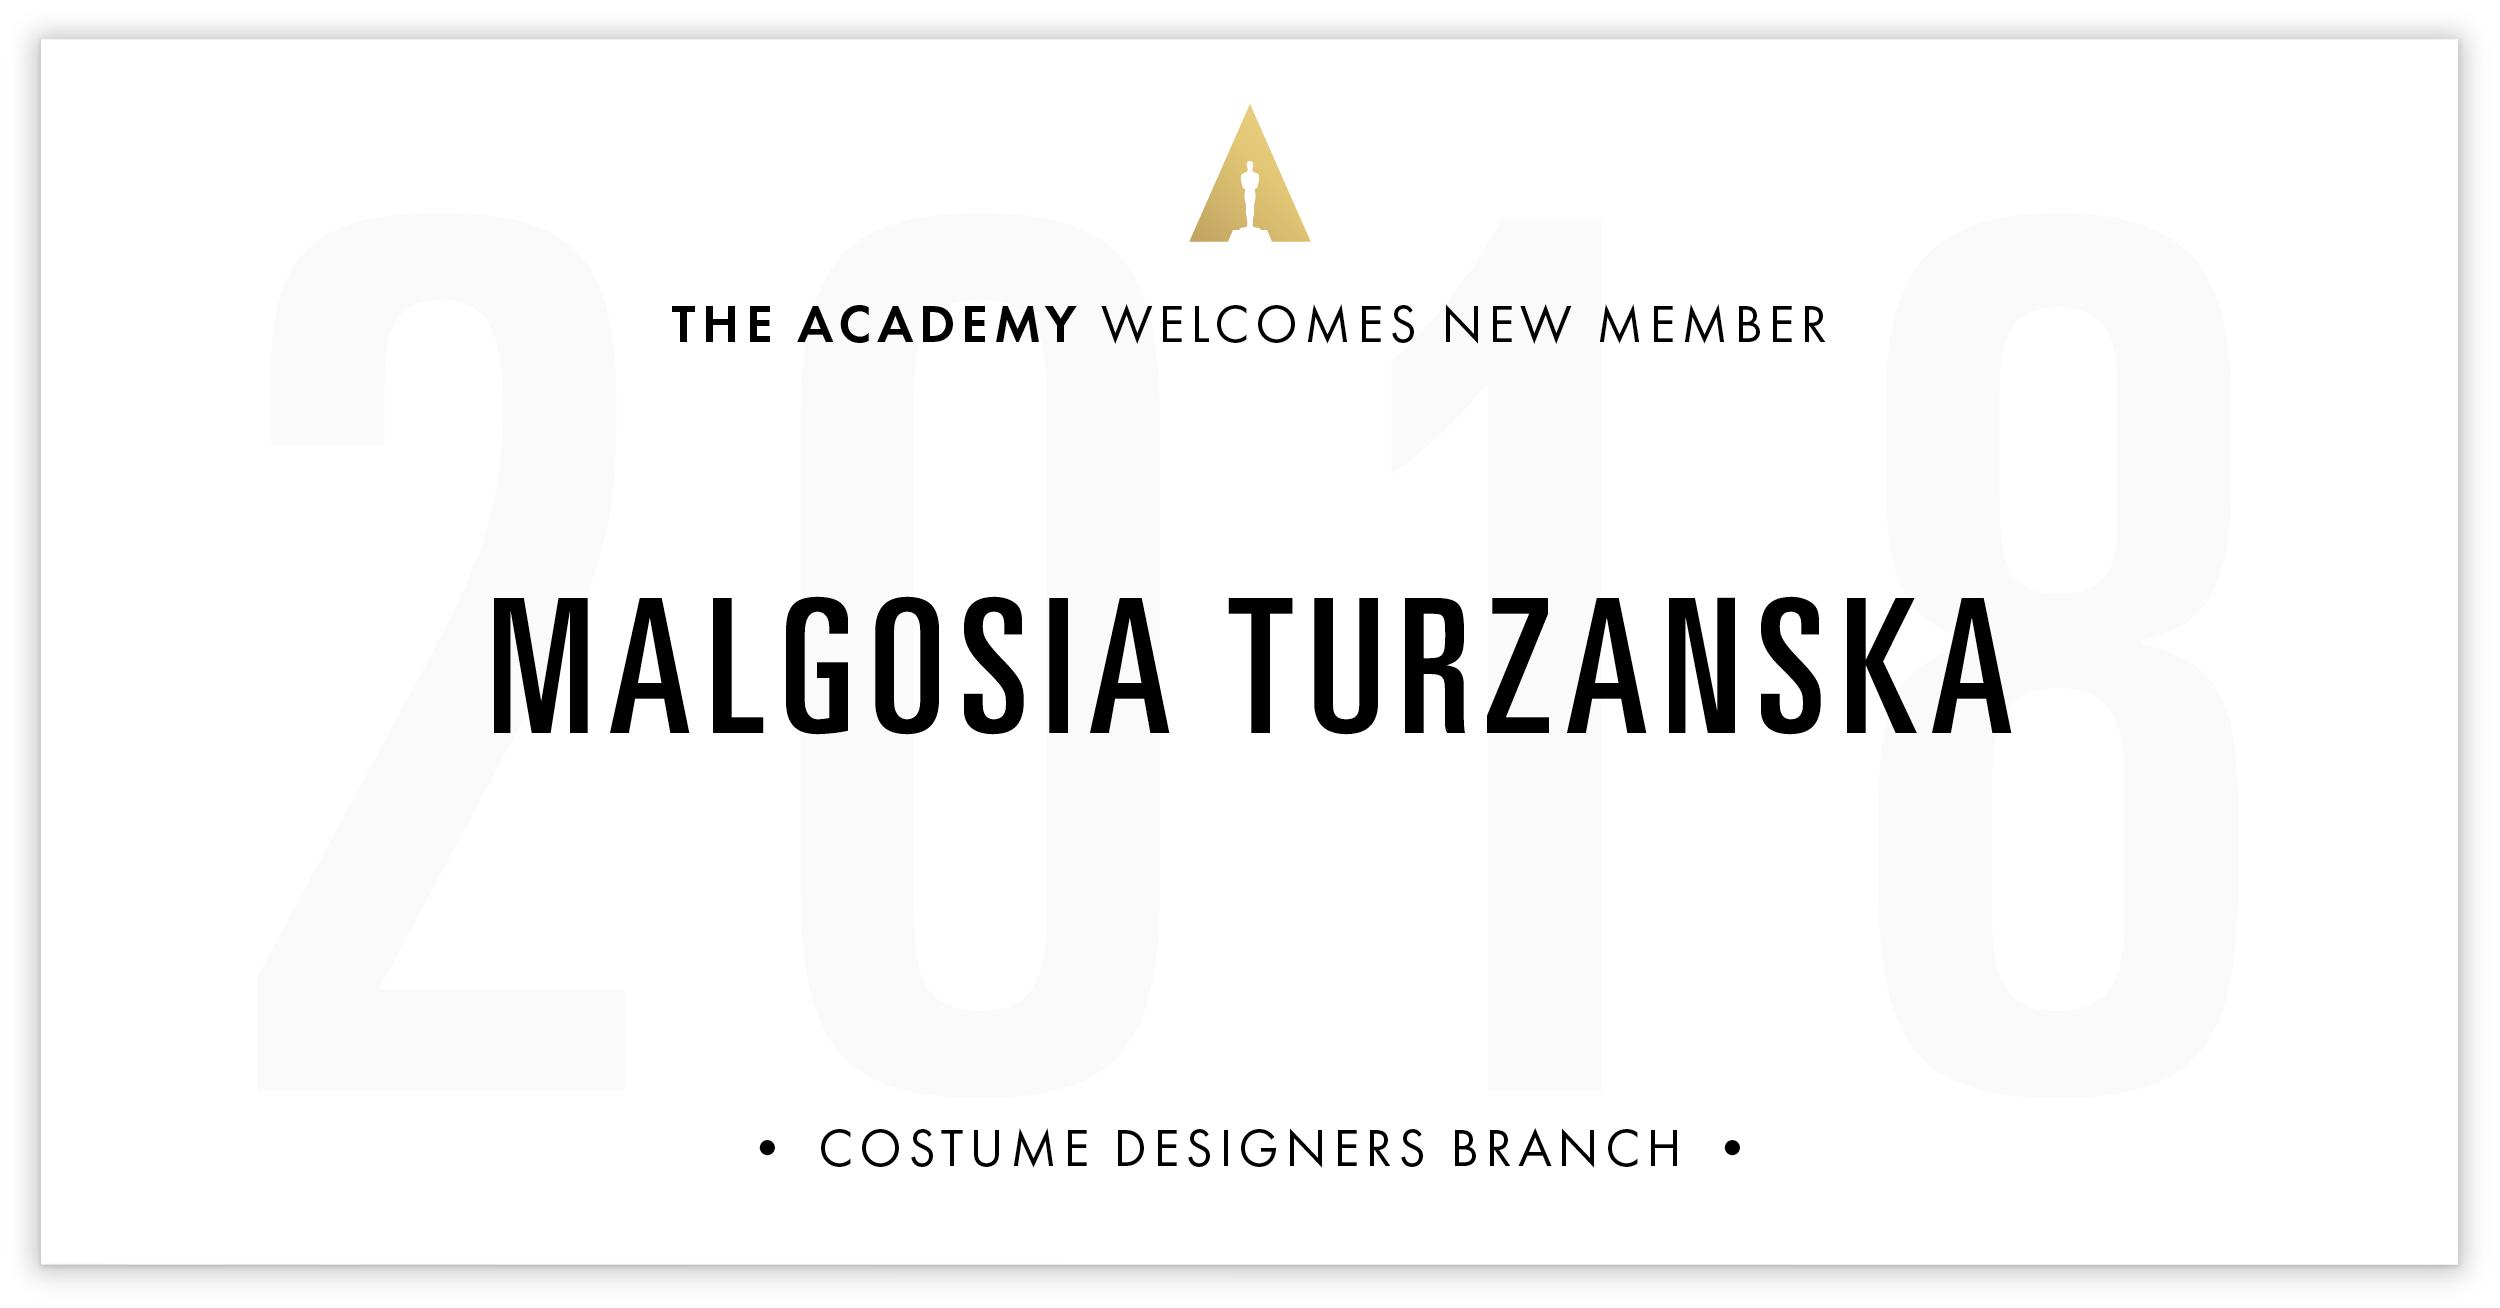 Malgosia Turzanska is invited!